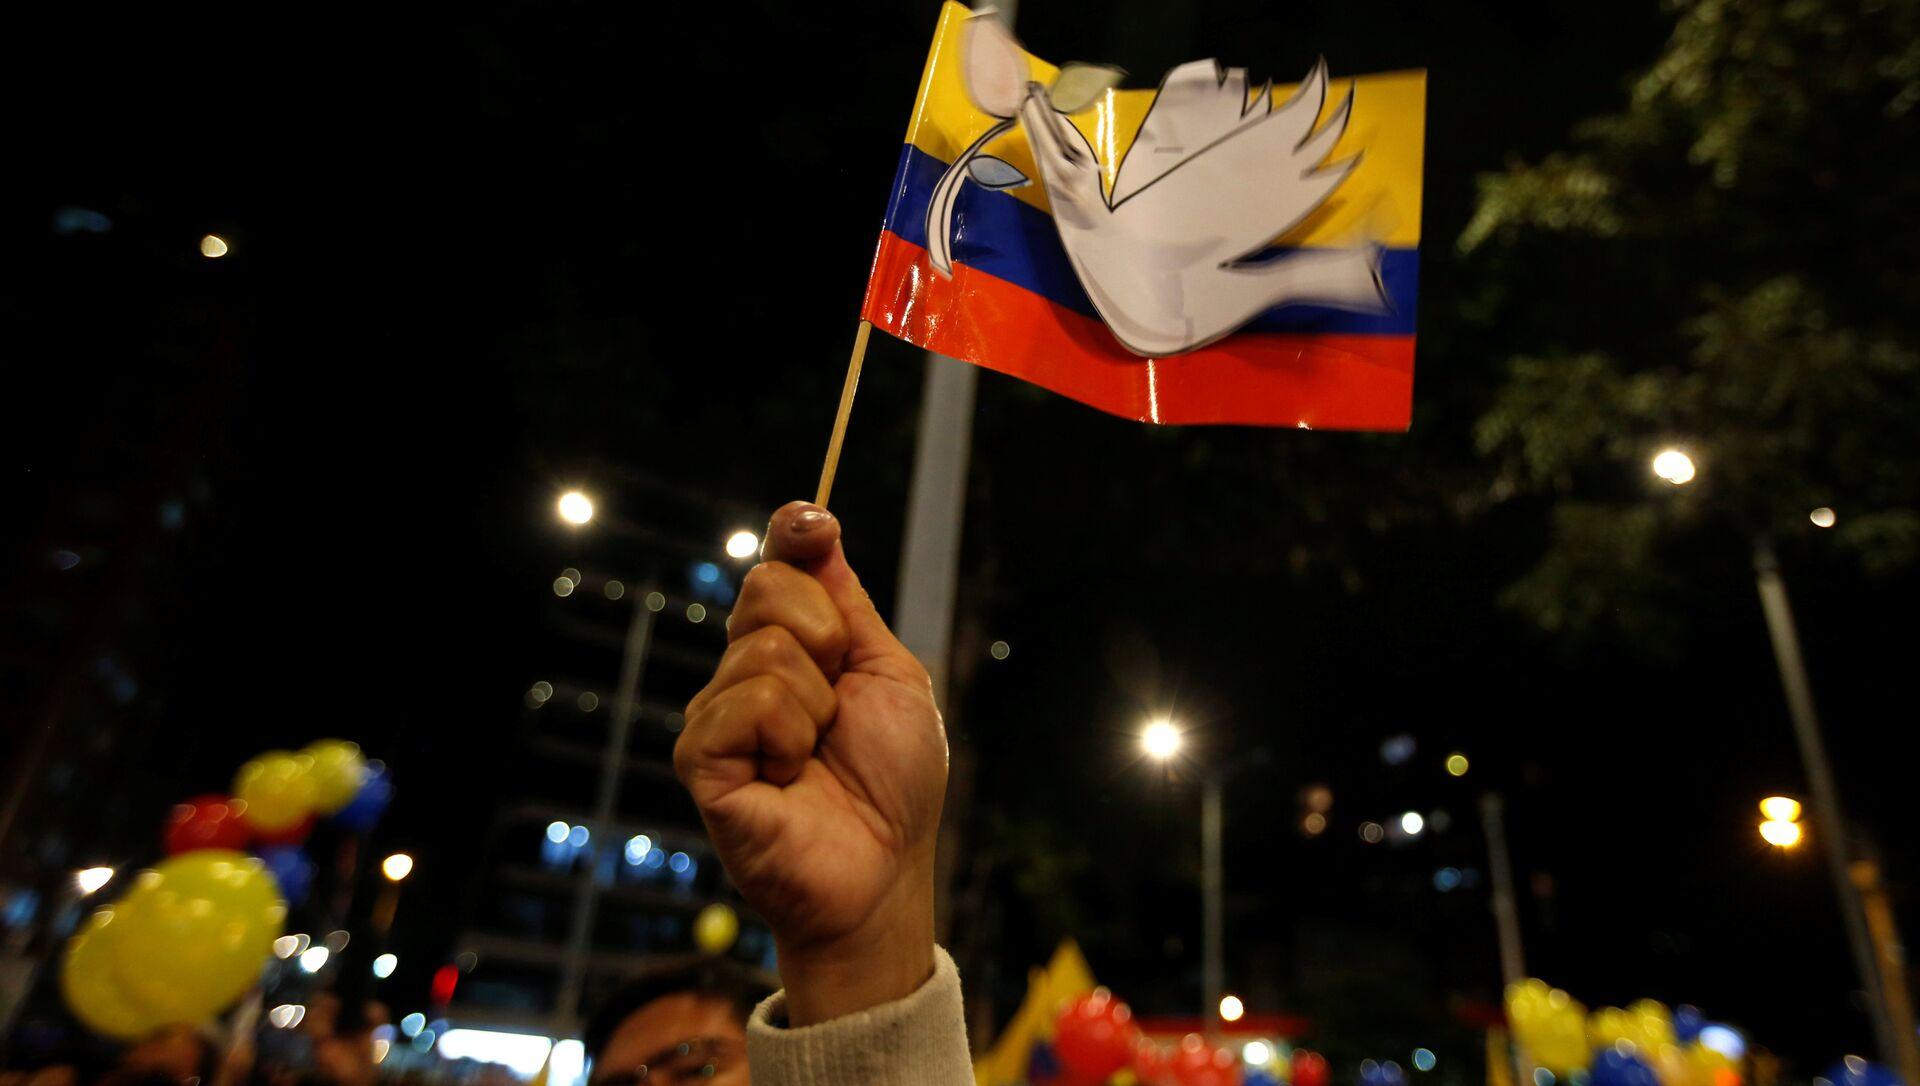 Paz en Colombia - Sputnik Mundo, 1920, 21.01.2021